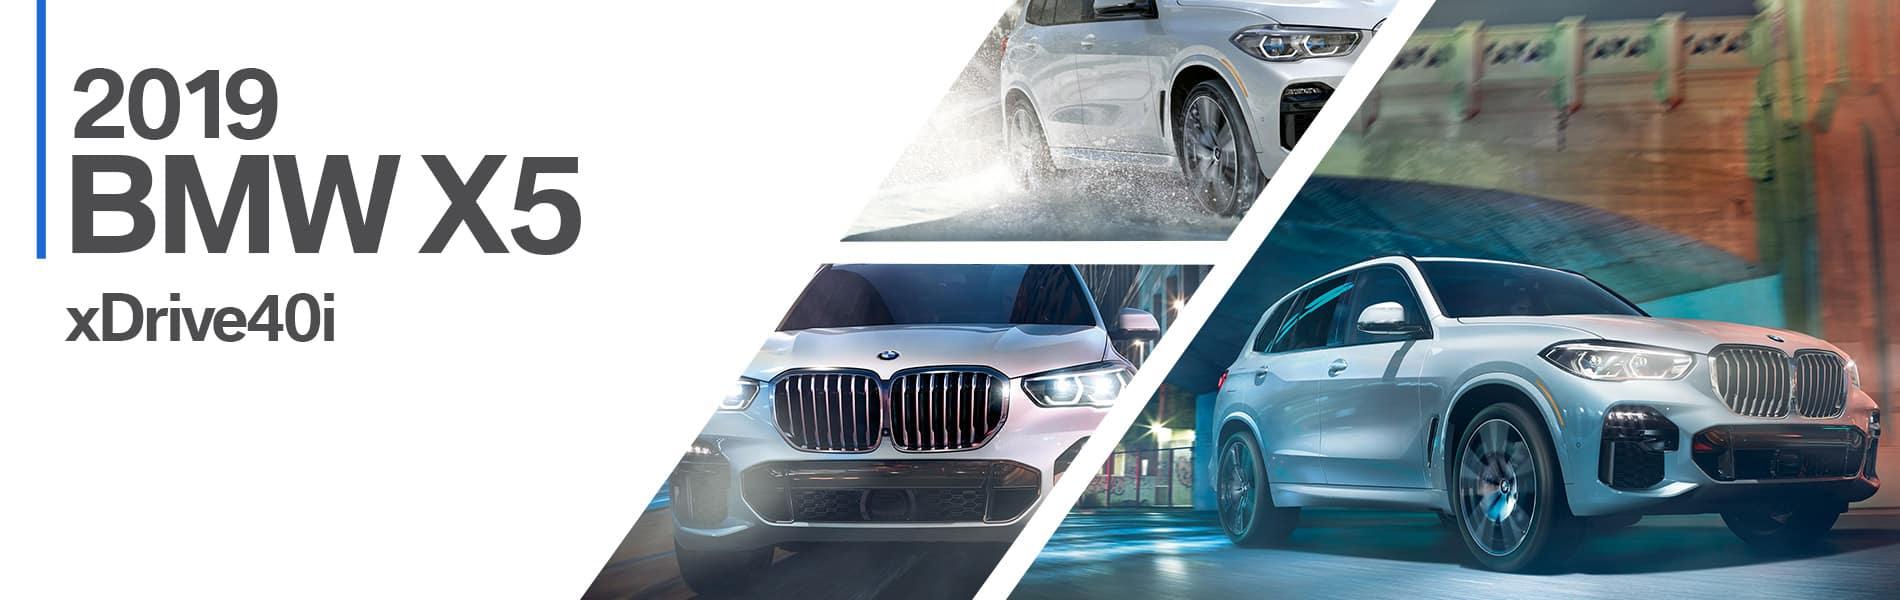 2019 BMW X5 xDrive40i | Fort Wayne, IN